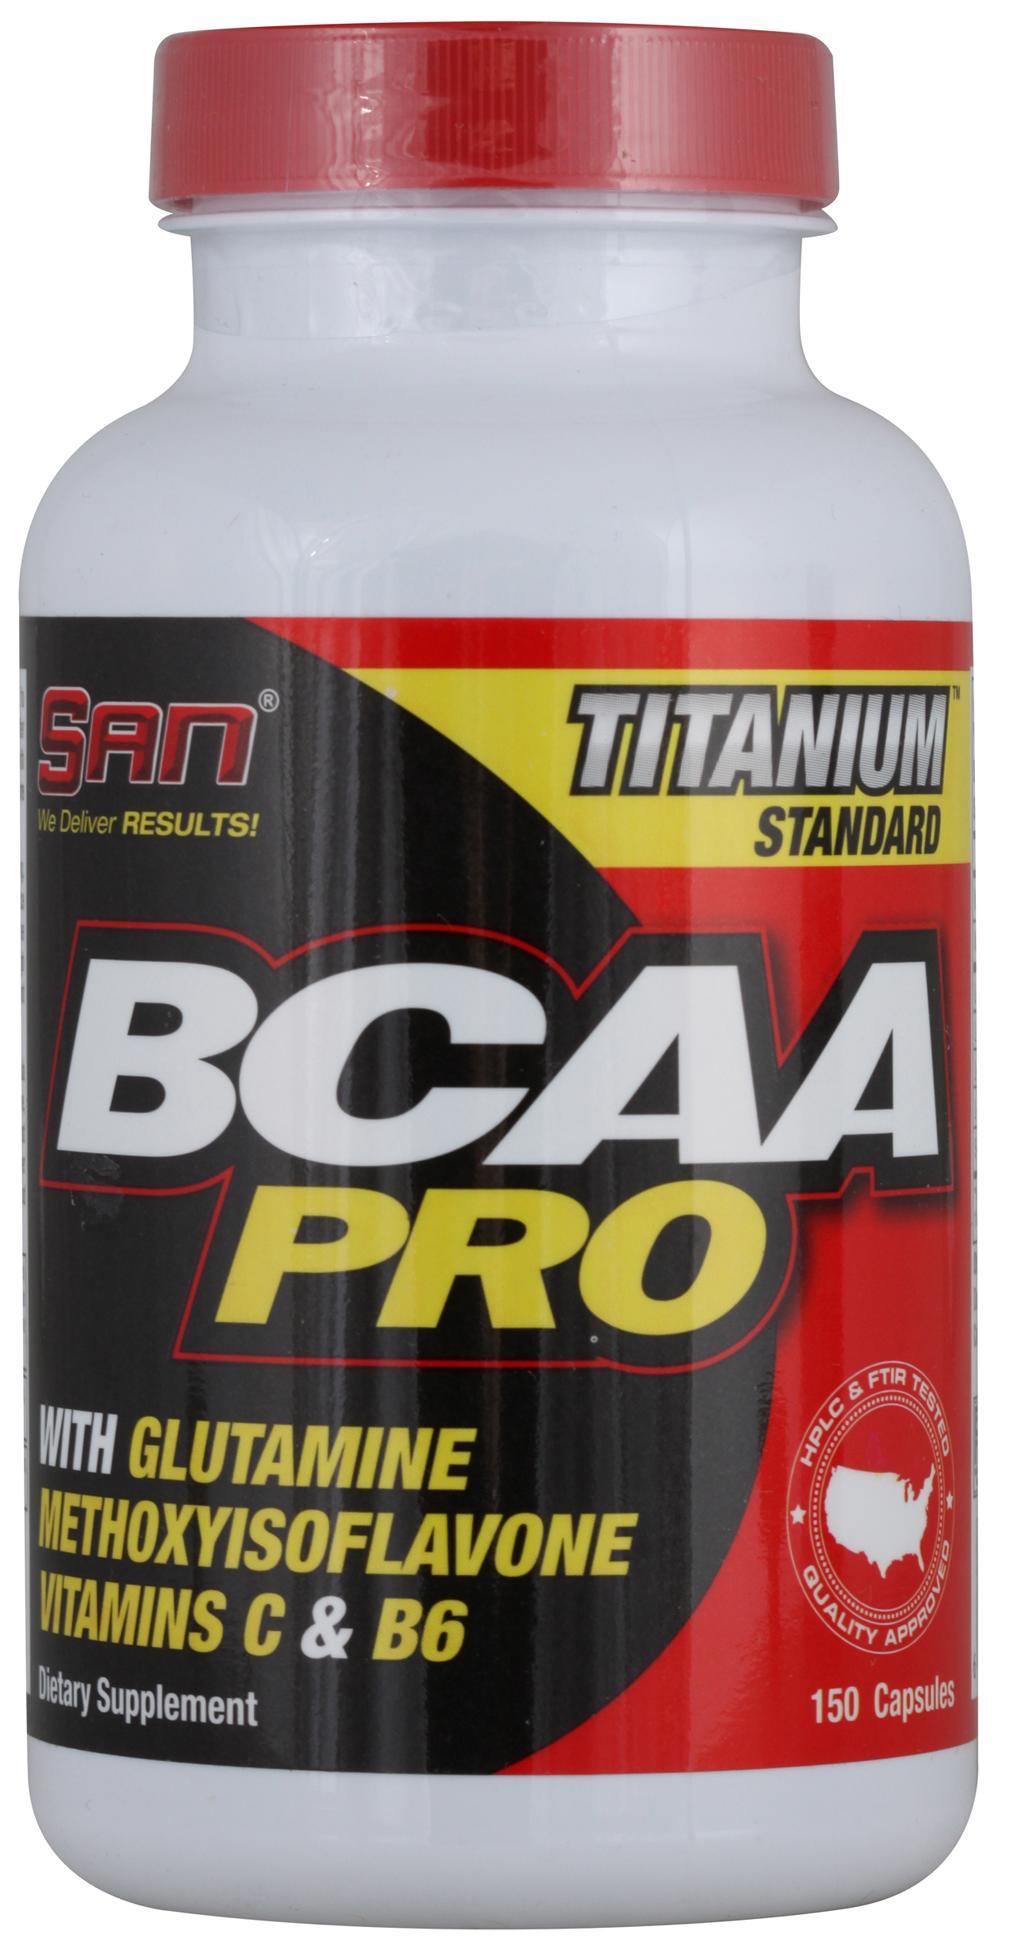 Аминокислоты BCAA Pro, 150 капсул, SAN